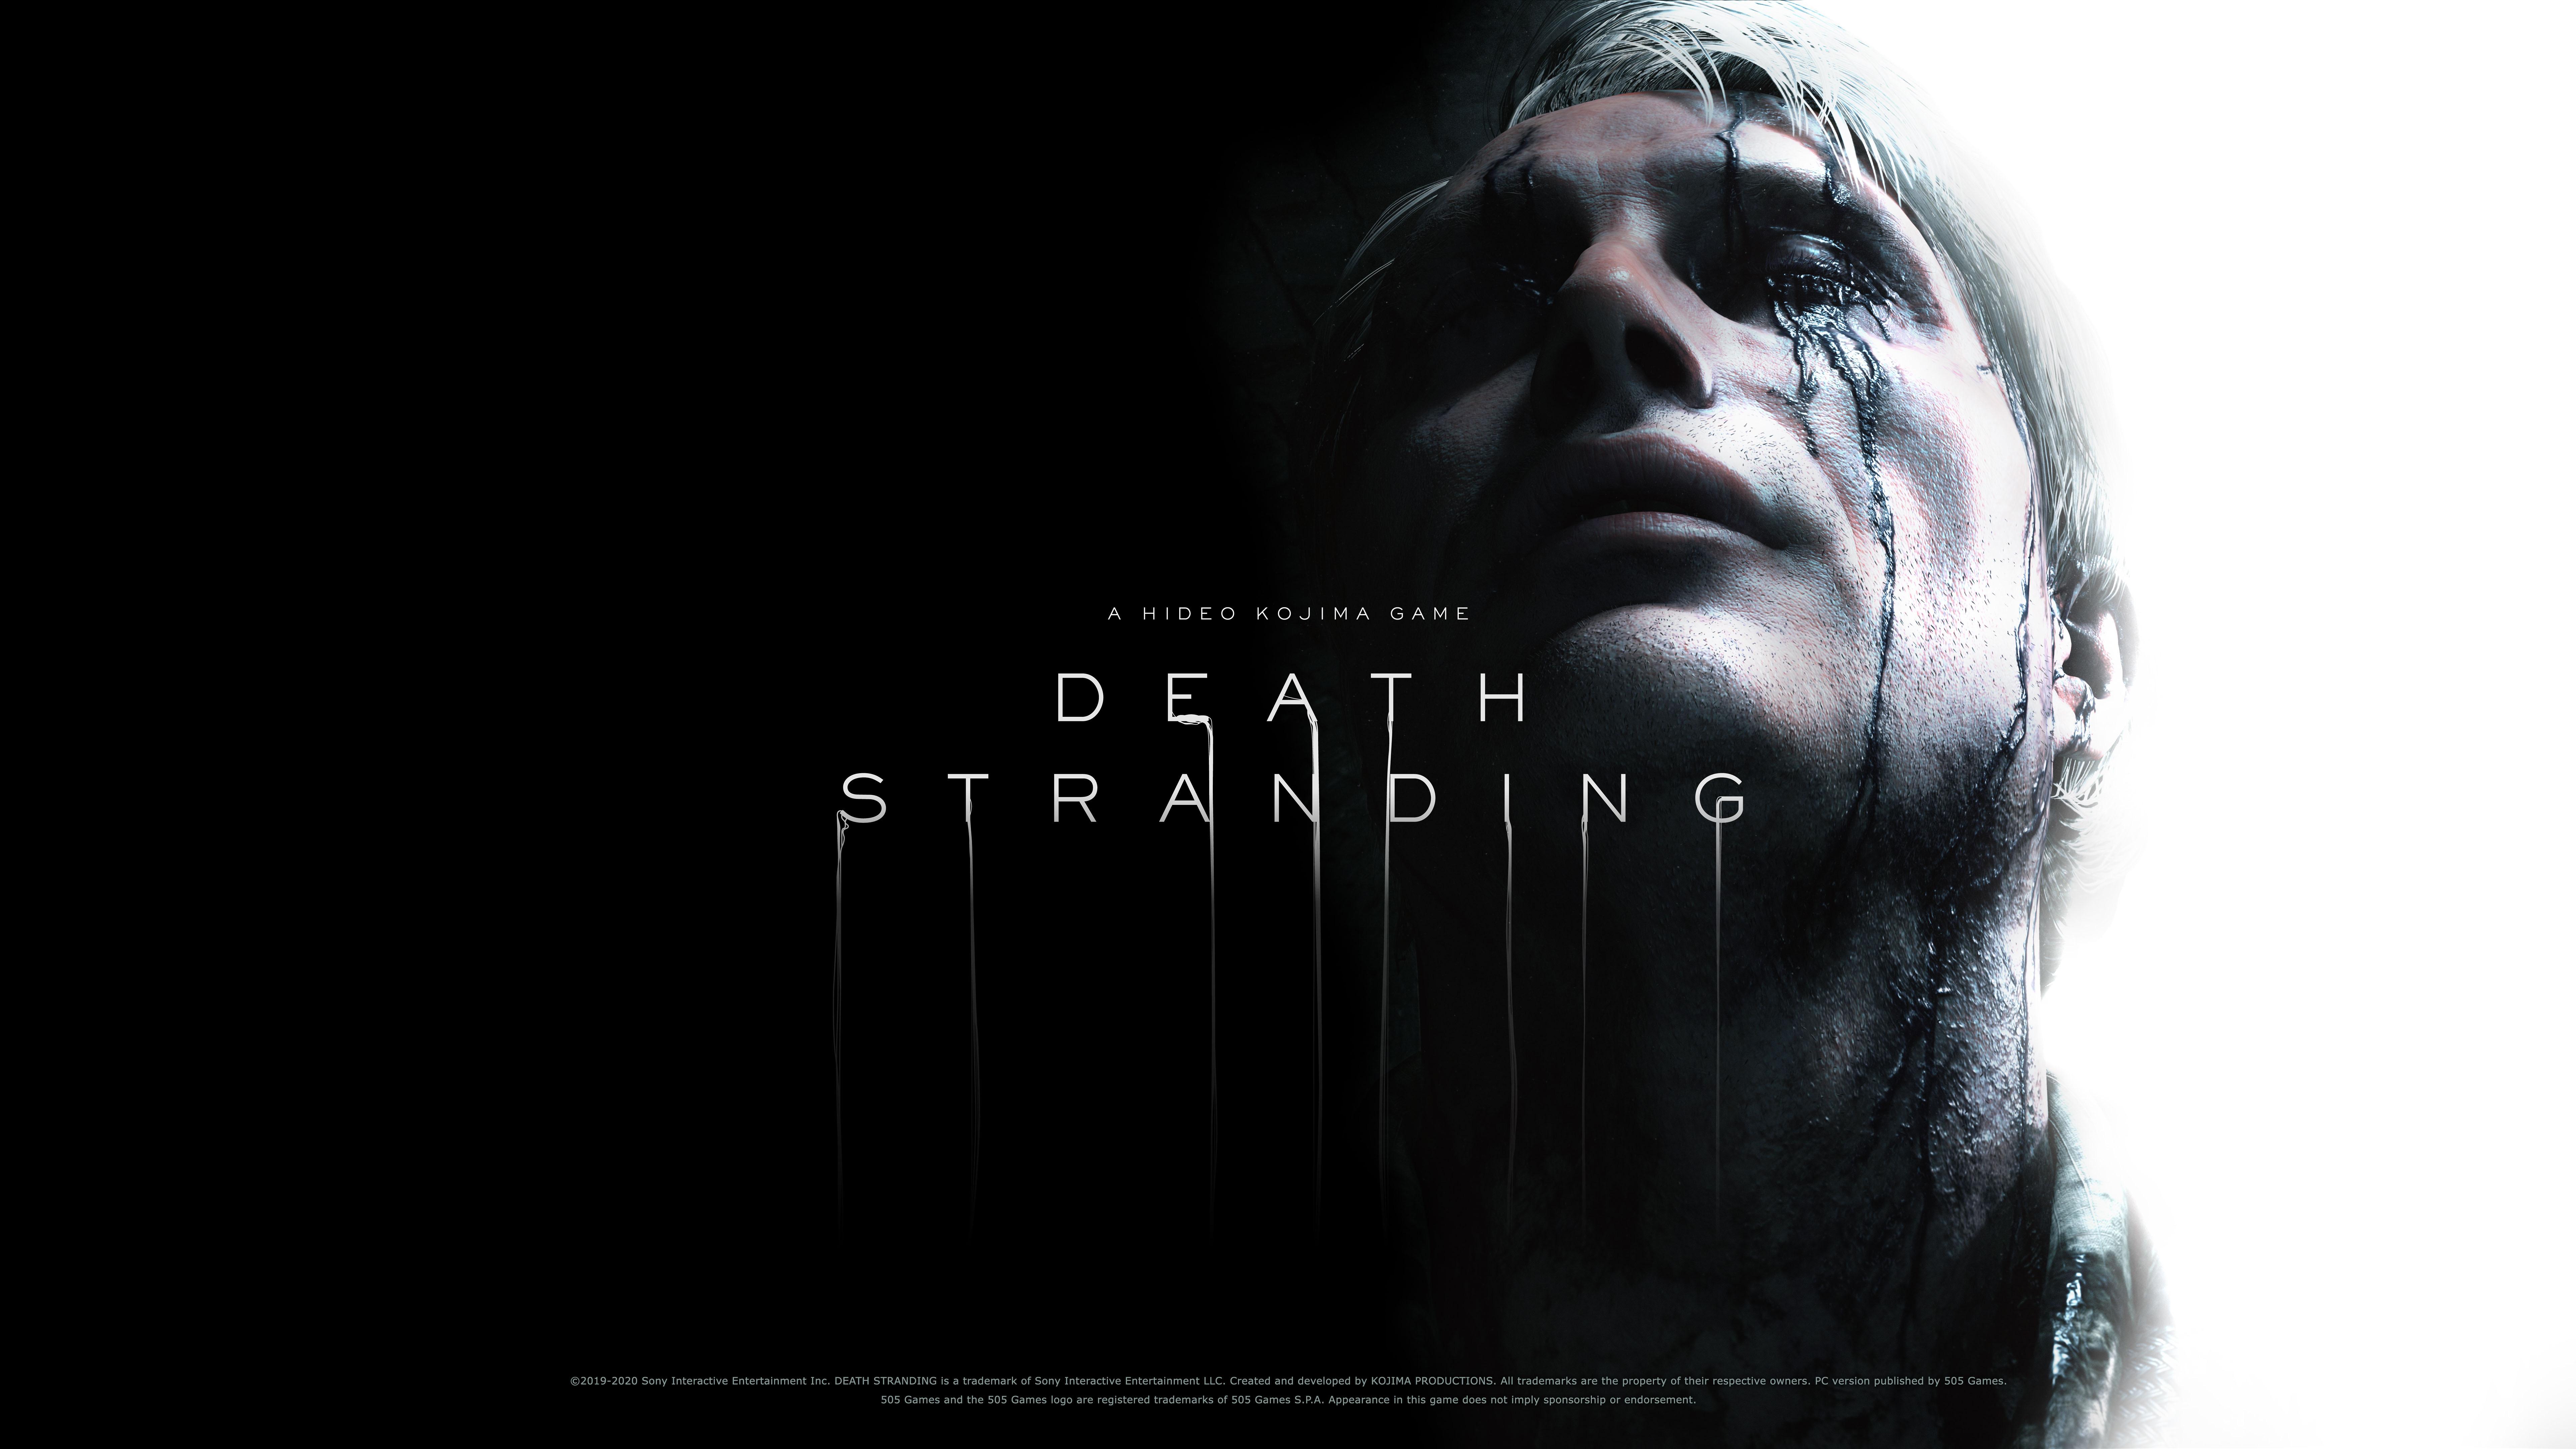 General 7680x4320 Death Stranding Hideo Kojima Mads Mikkelsen Cliff Unger (Death Stranding) video games